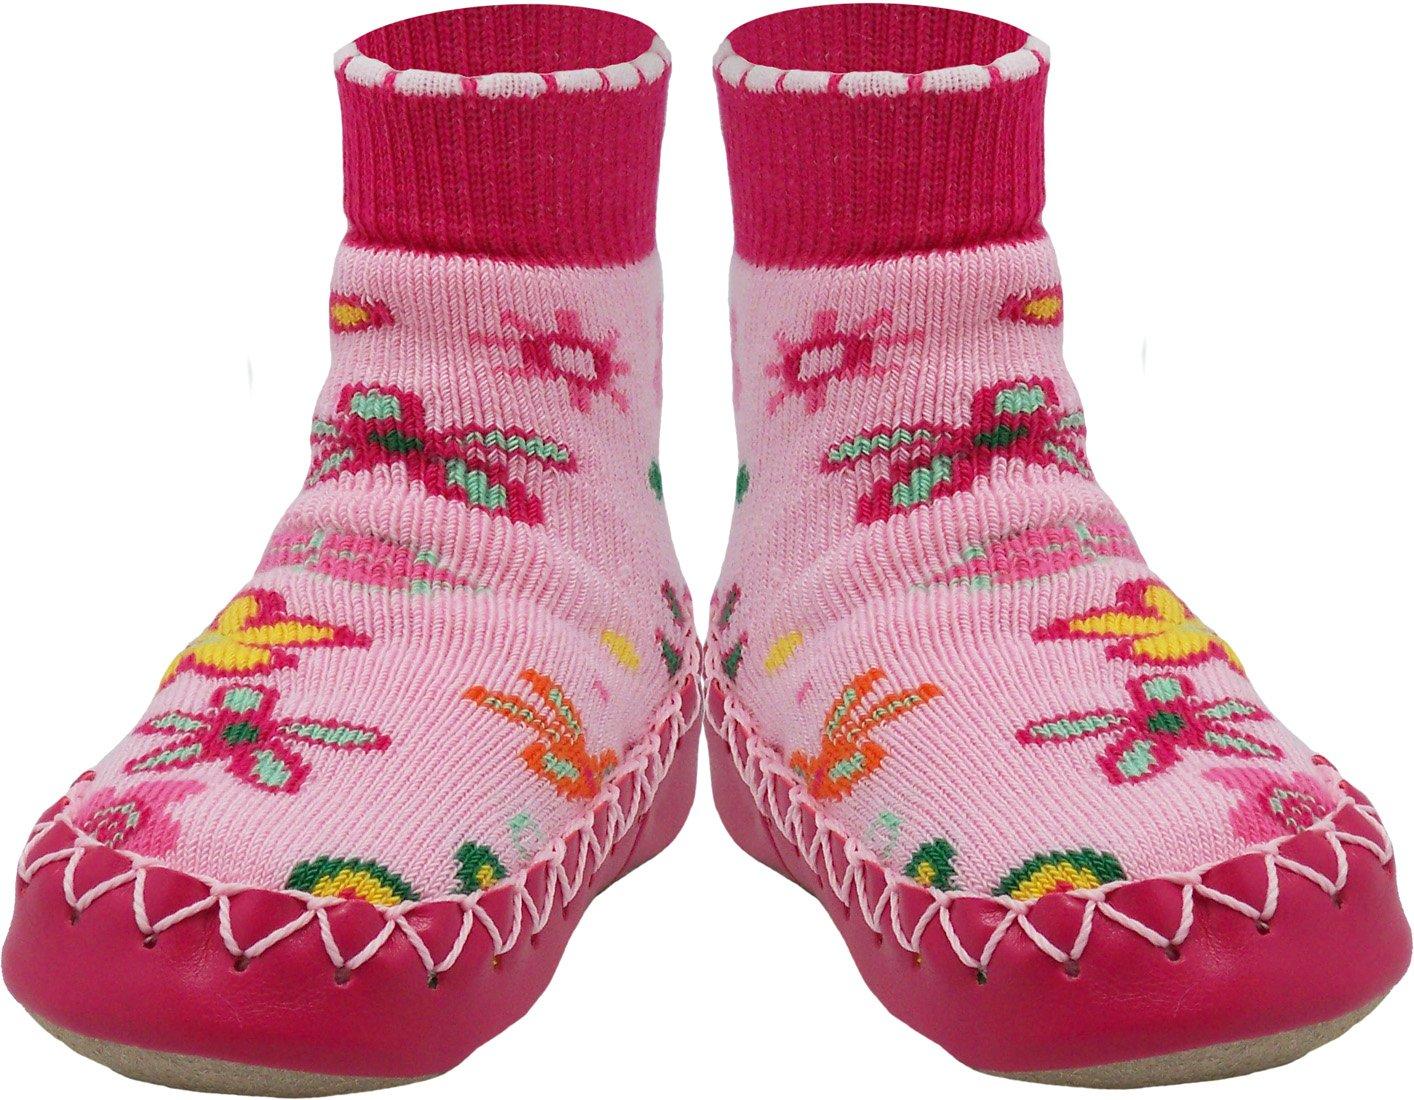 Konfetti Wolf Moon Swedish Moccasin Slipper Sock